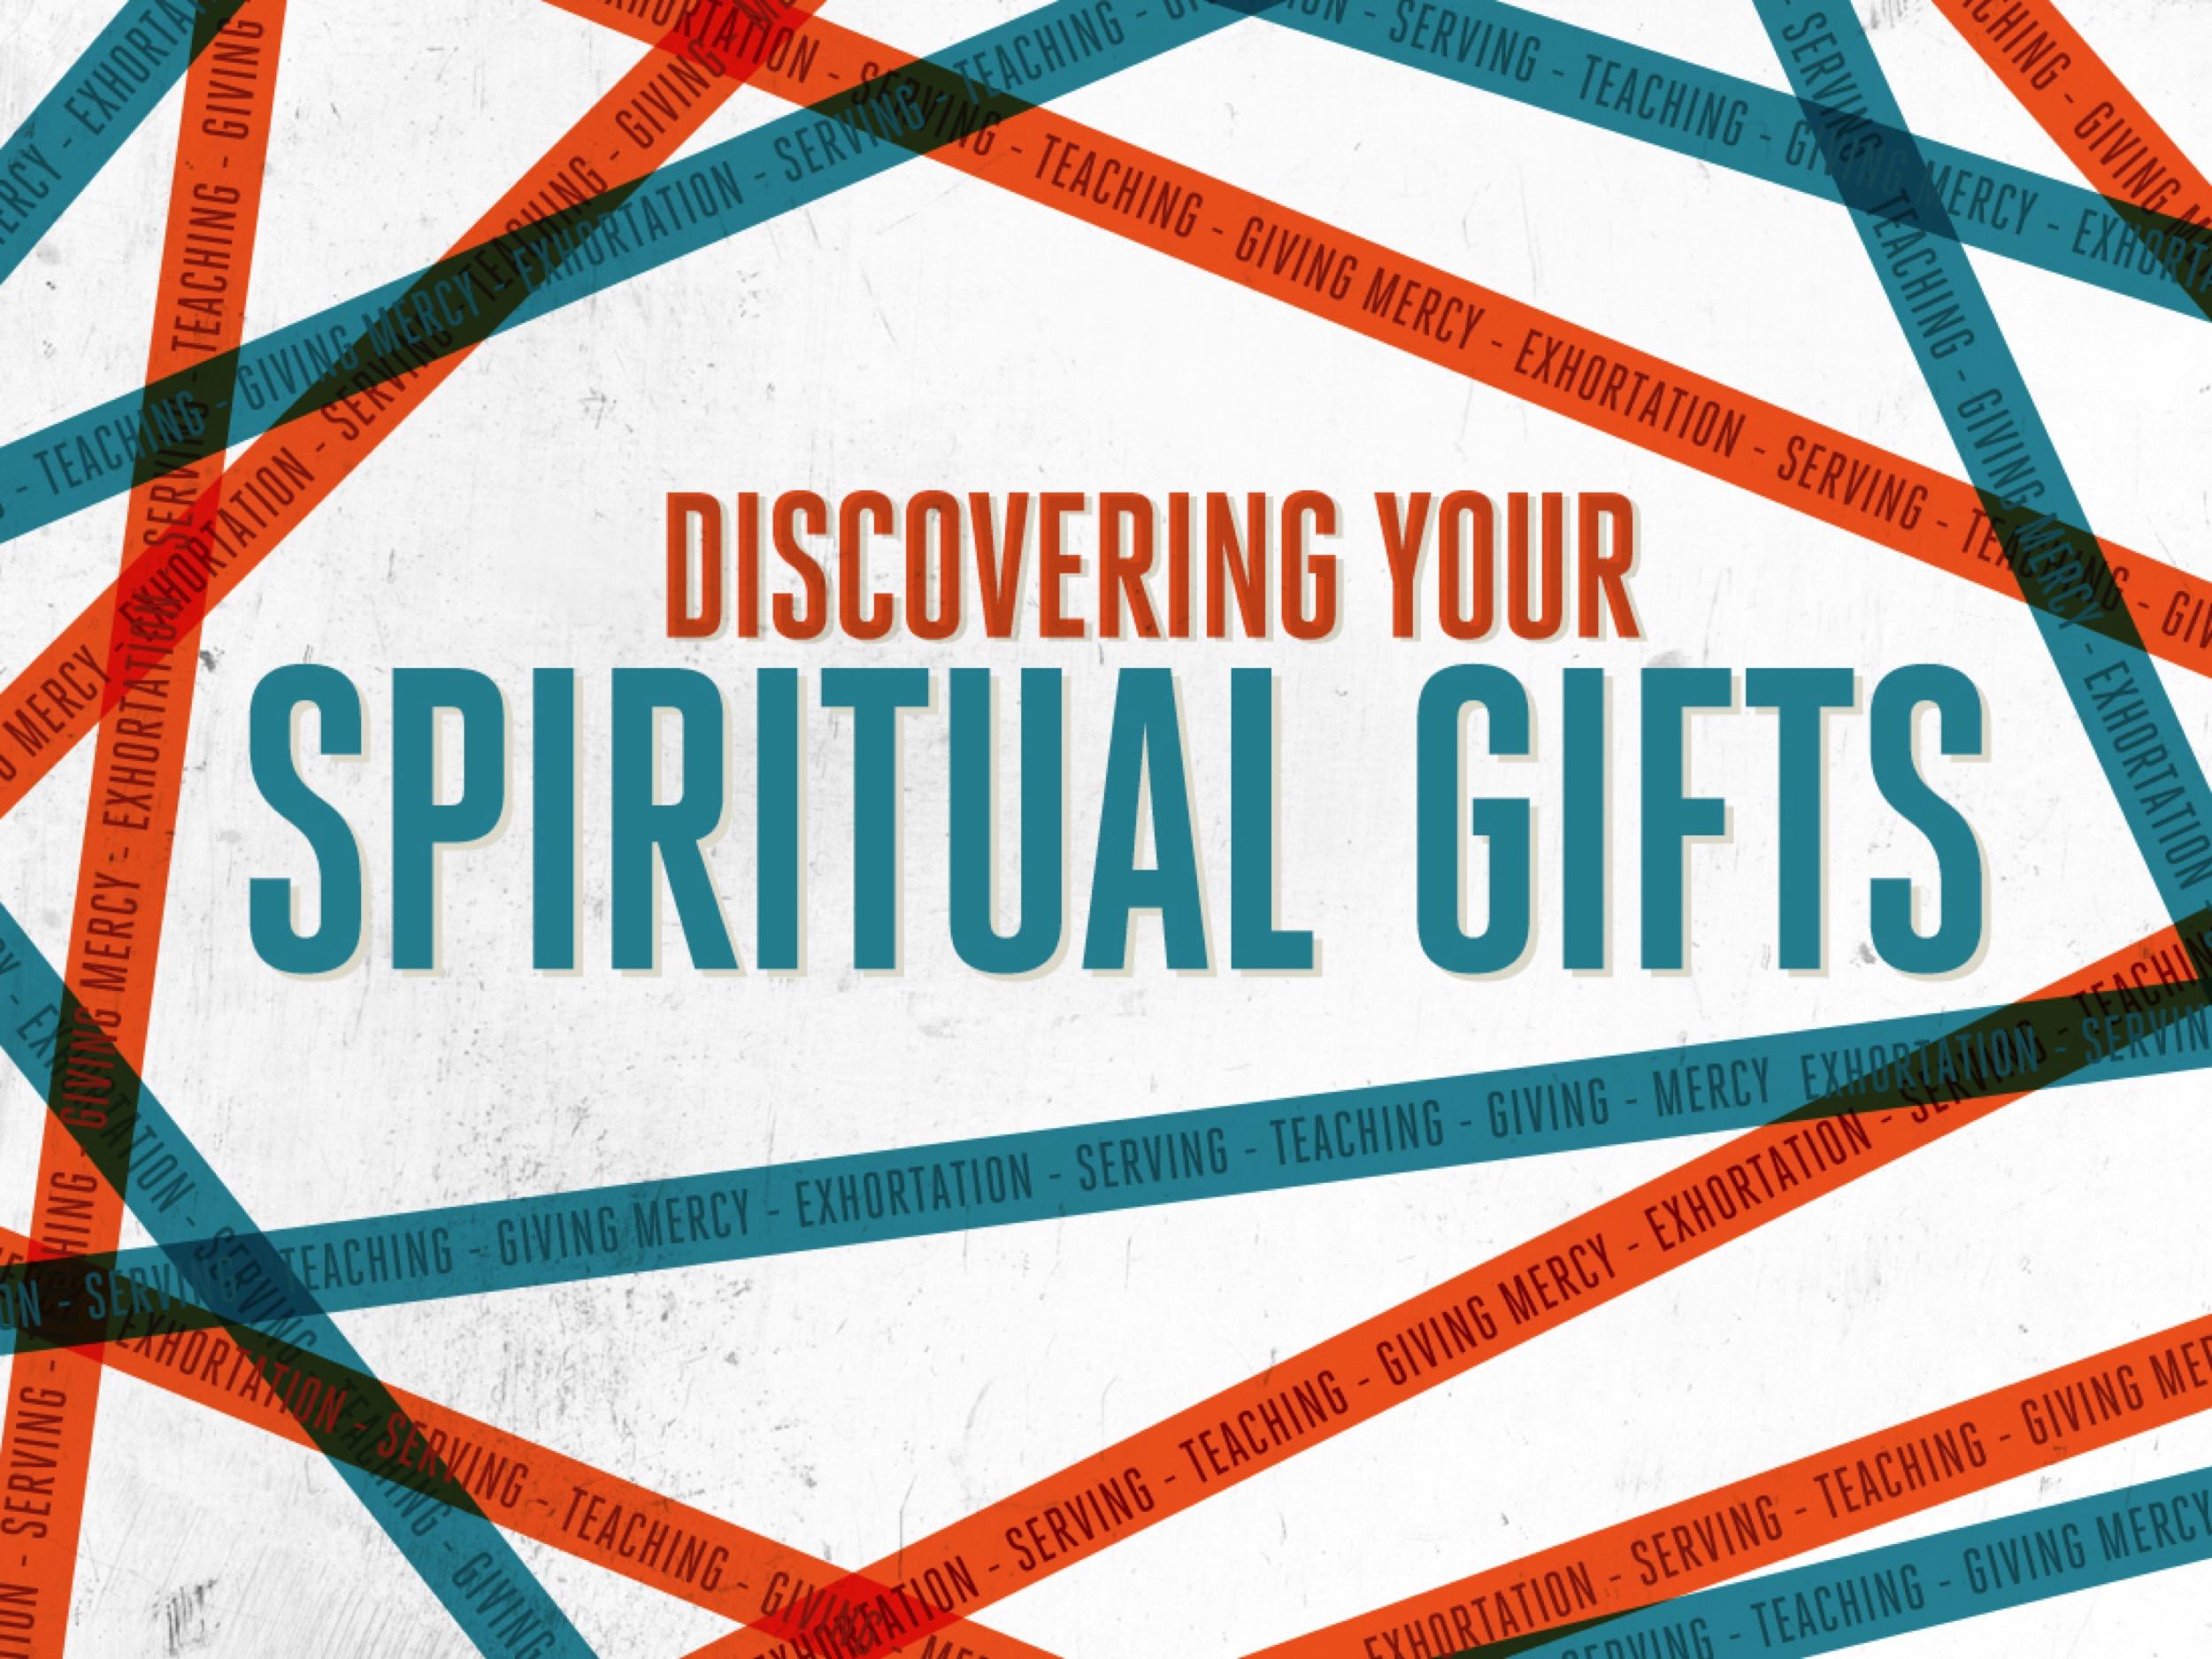 Spiritual Gifts P2 7/6/2017 8:39:26 AM